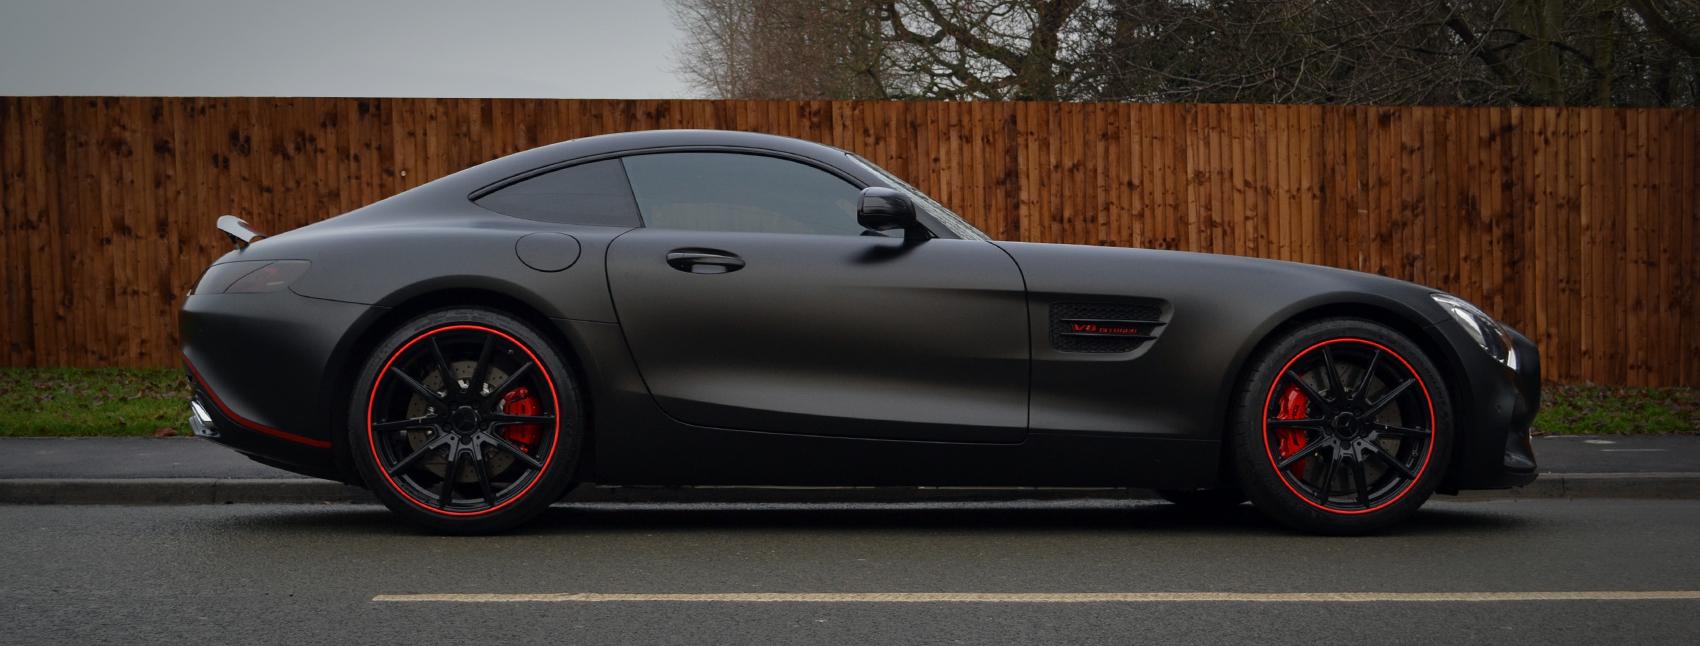 Mercedes AMG GTS Reforma UK Banner Case Study